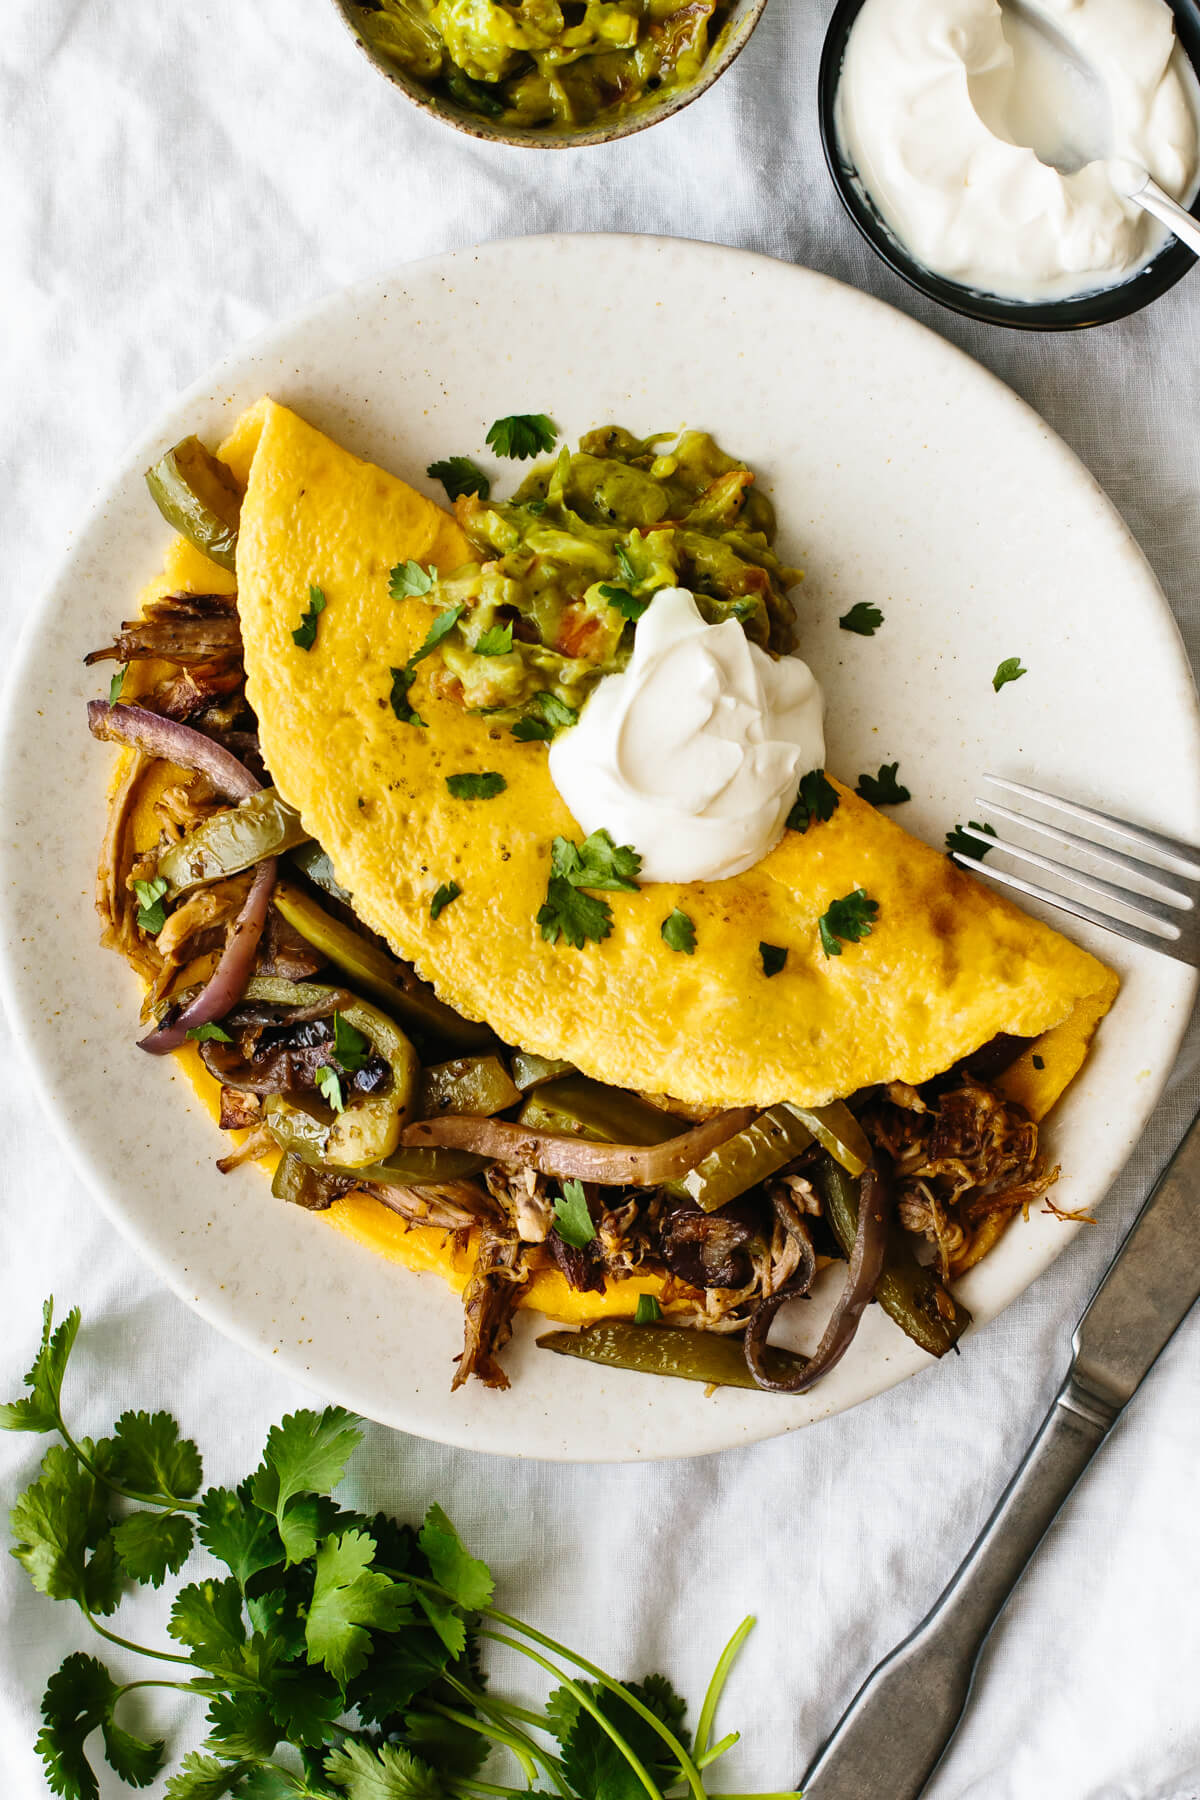 Carnitas omelette with fajita veggies on a plate.